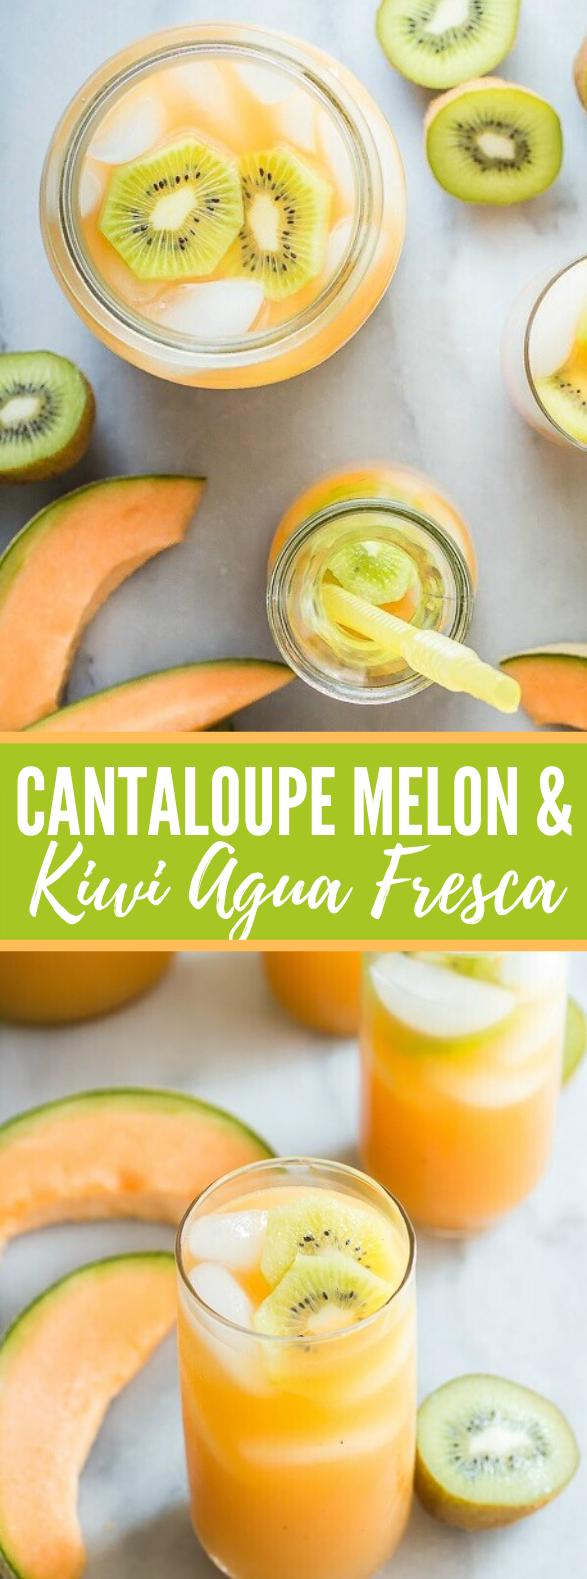 CANTALOUPE MELON AND KIWI AGUA FRESCA #drinks #summerday